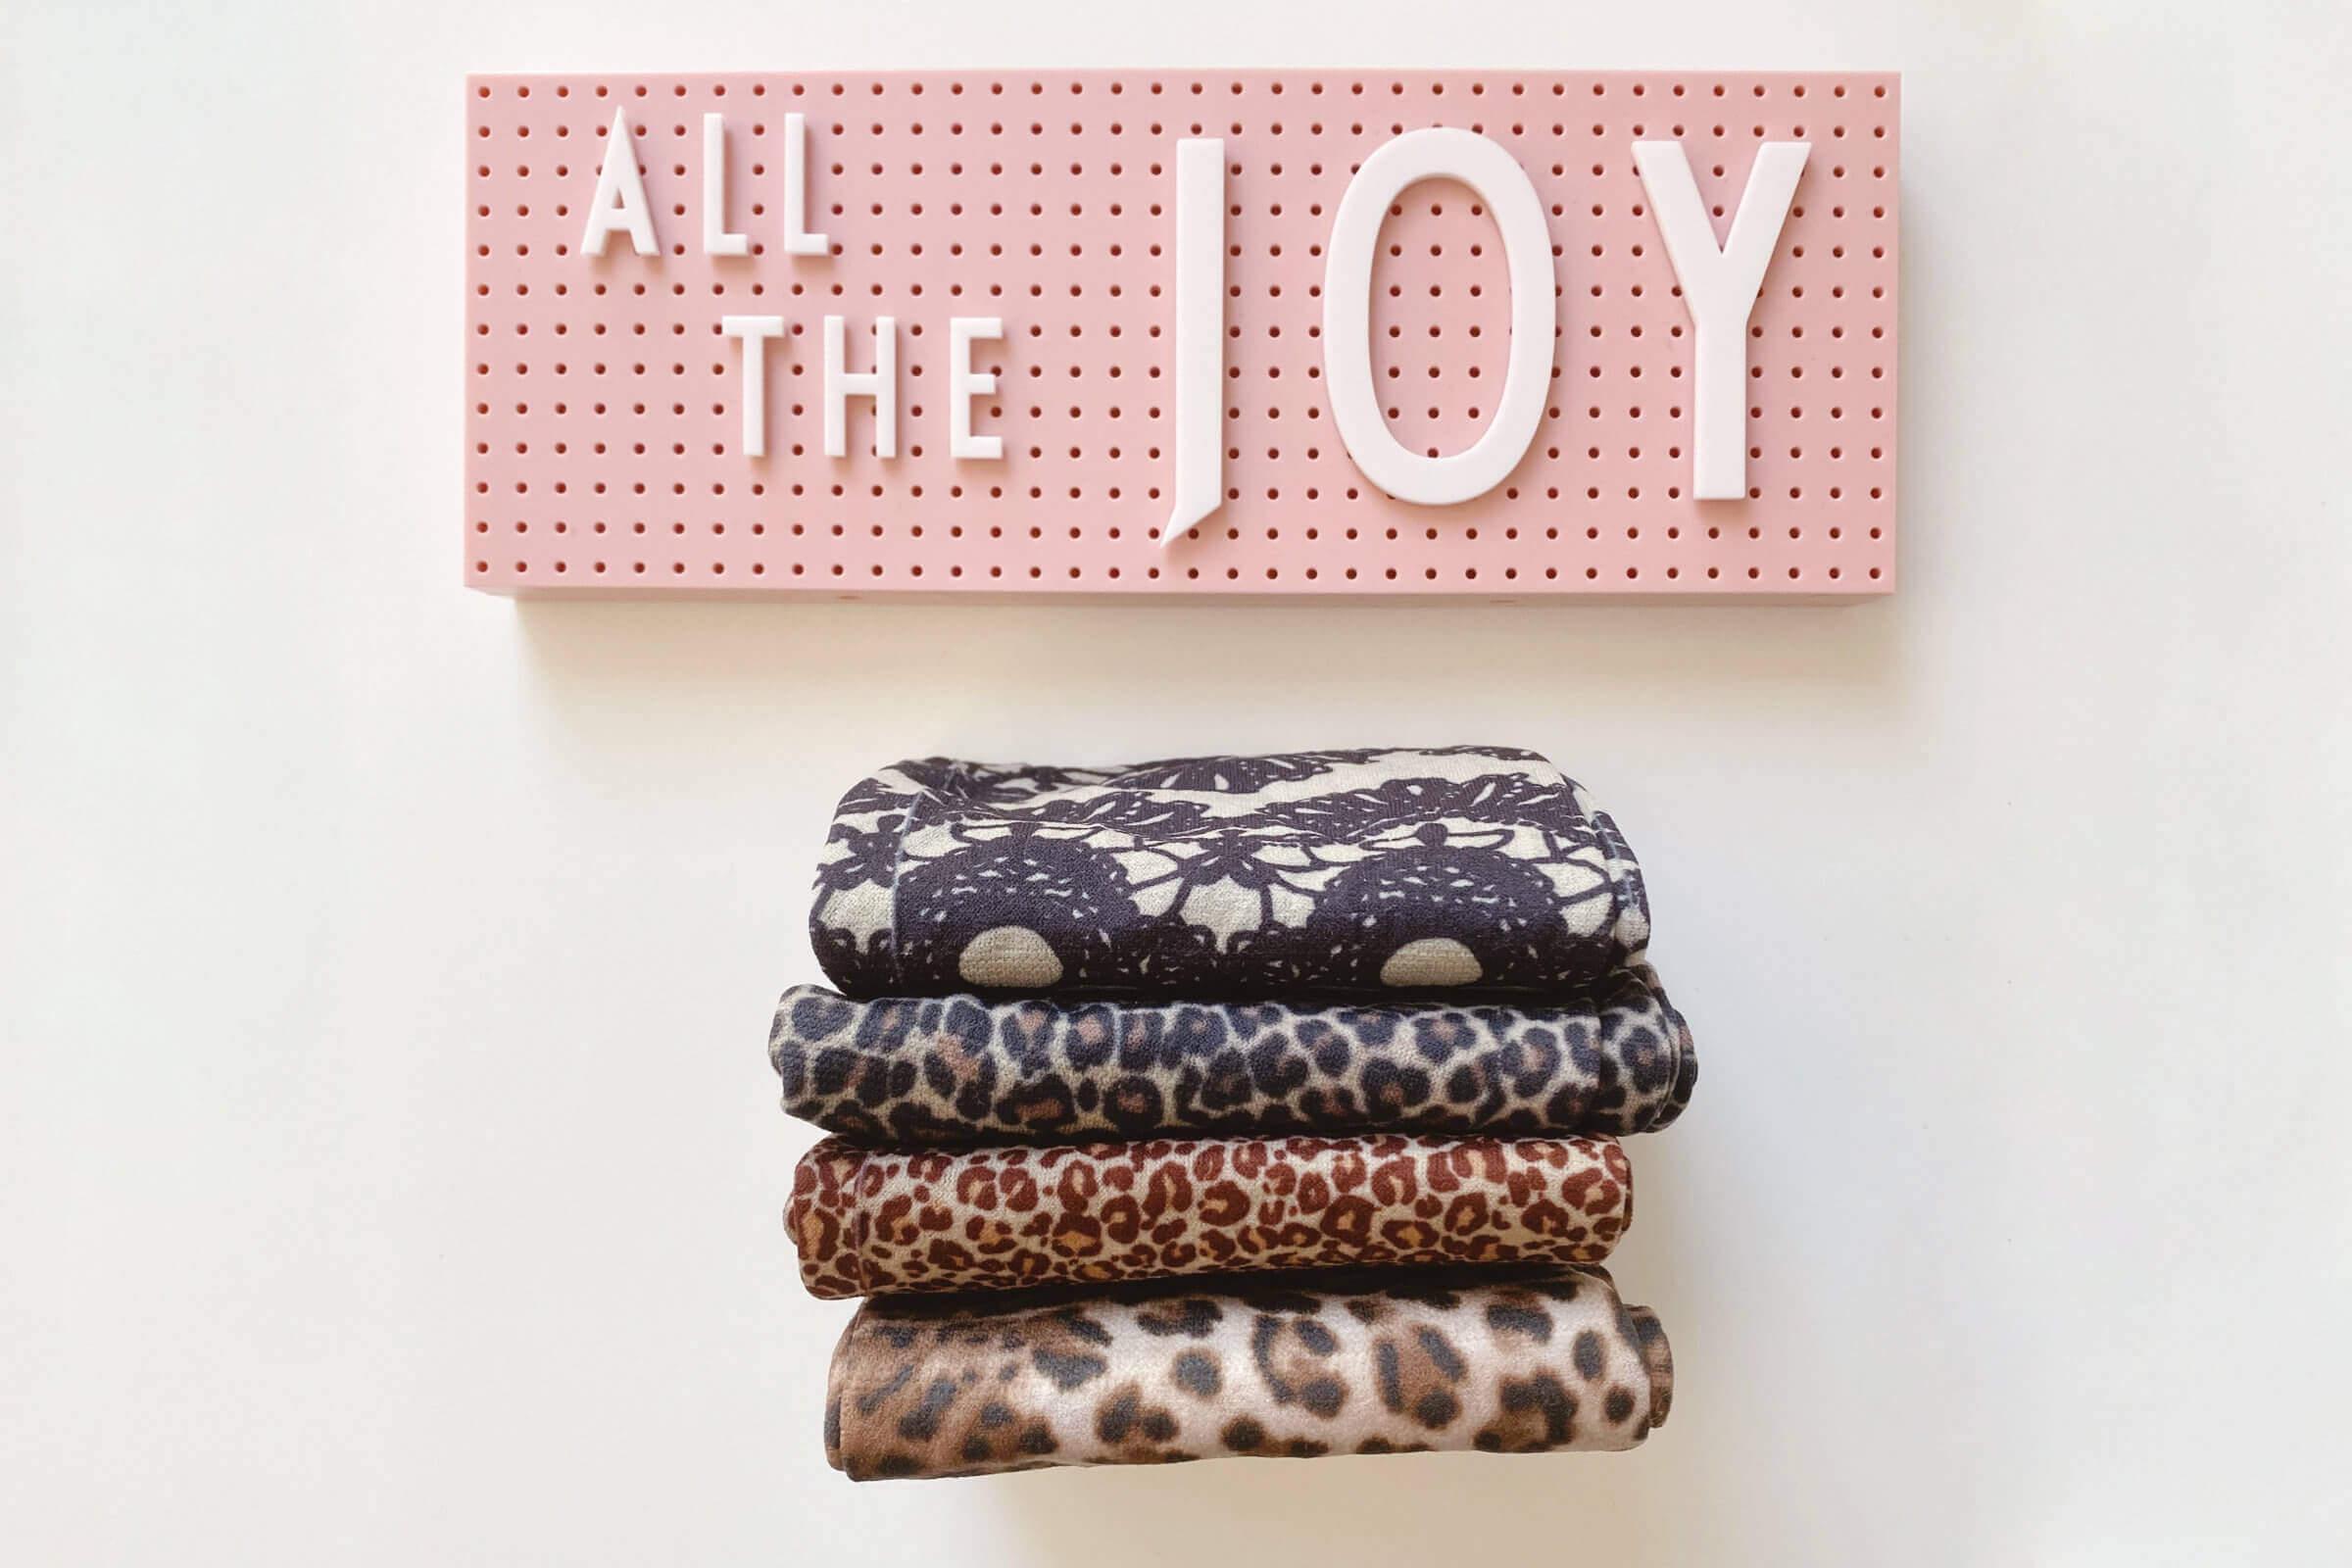 Neatly Folded Stockings That Spark Joy Using The KonMari Method Of Tidying